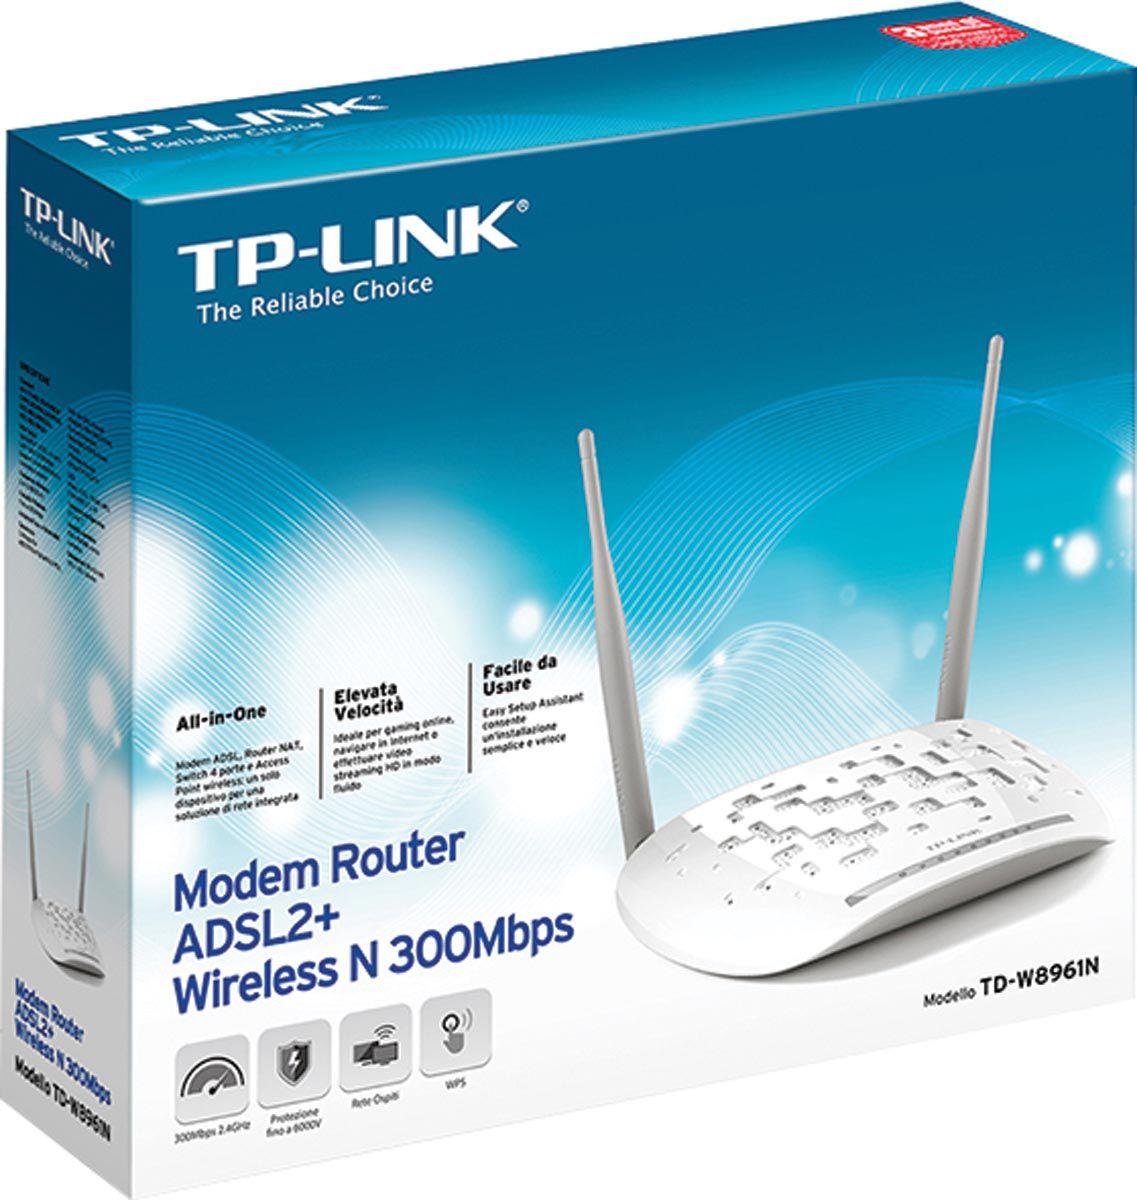 Modem Roteador Wireless N ADSL+2 300MBPS TD-W8961N